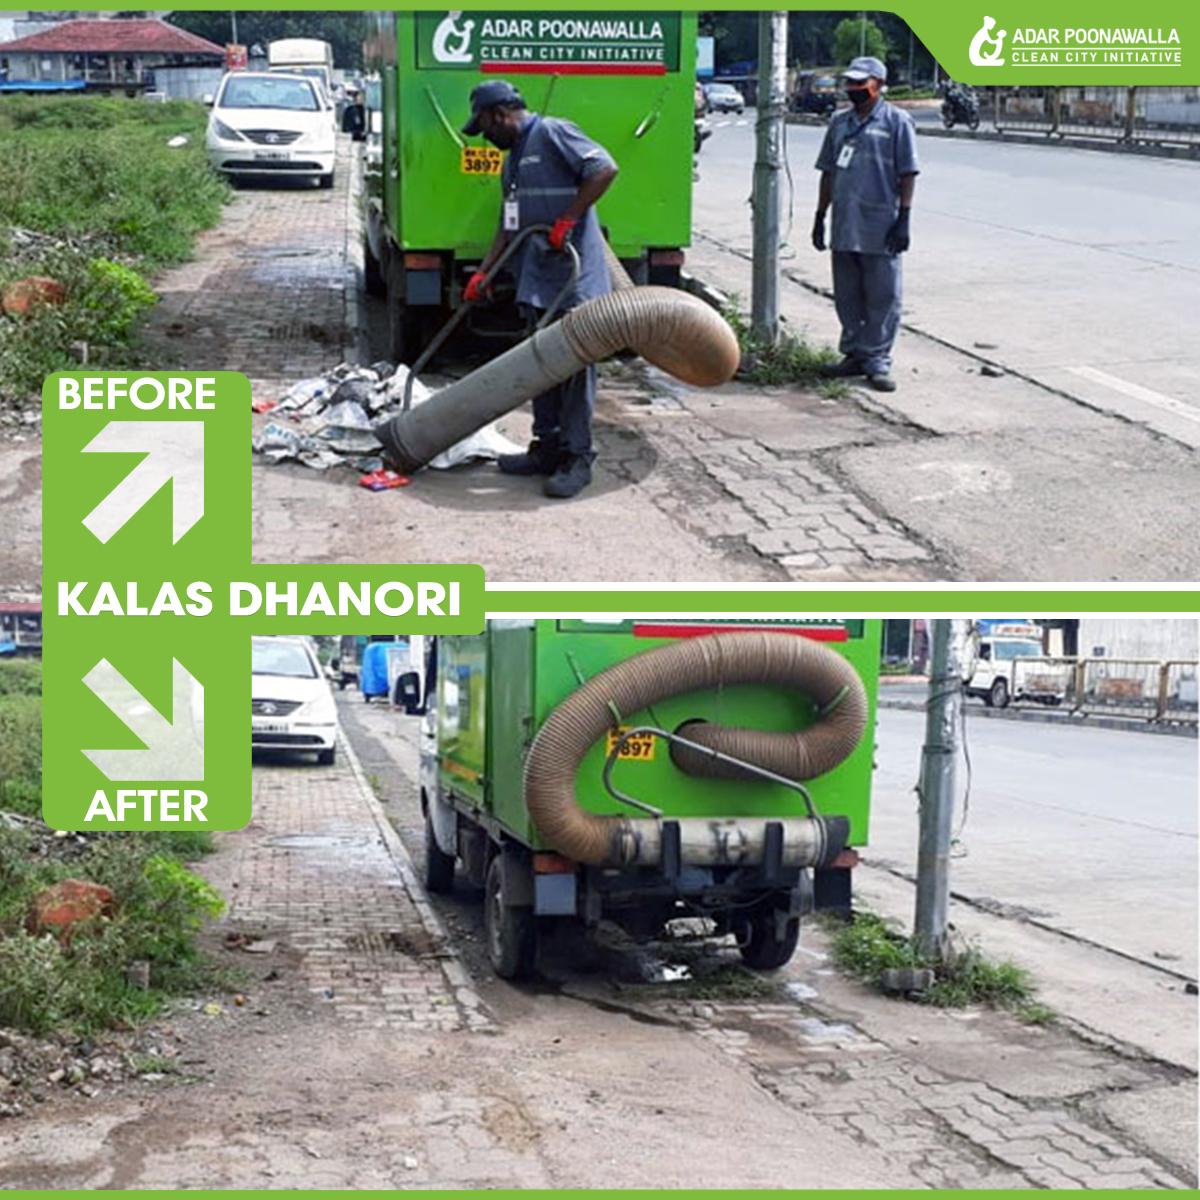 Transforming the city, one neighbourhood at a time!  #APCCI #TransformingPune #CleanCity #Pune #gogreen #cleanindia #plasticfree #SwachhBharat #litterfree #zerowaste